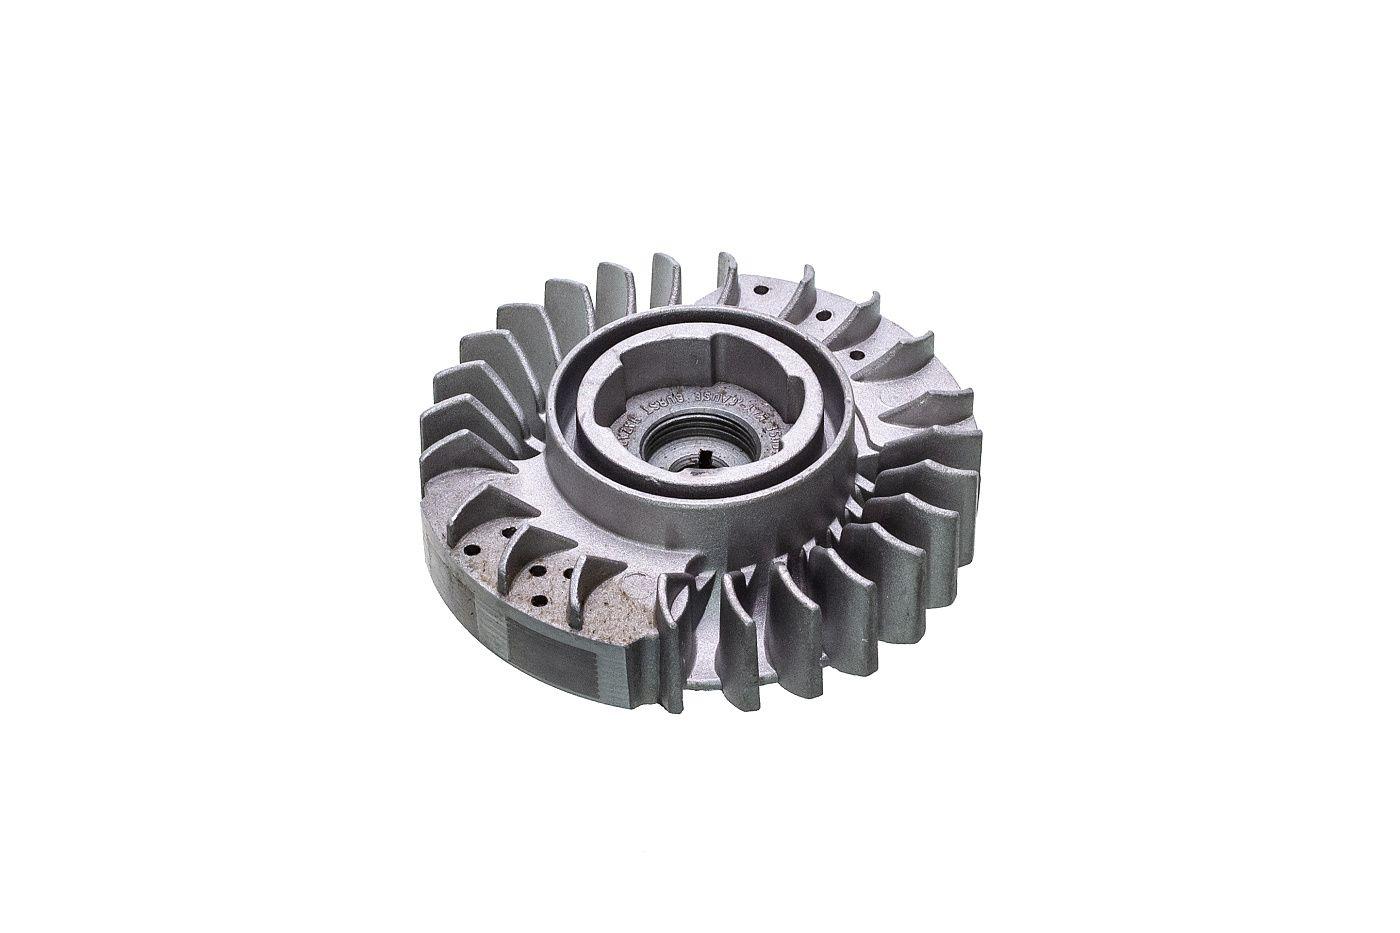 Ventilátor Stihl MS260 MS240 026 024